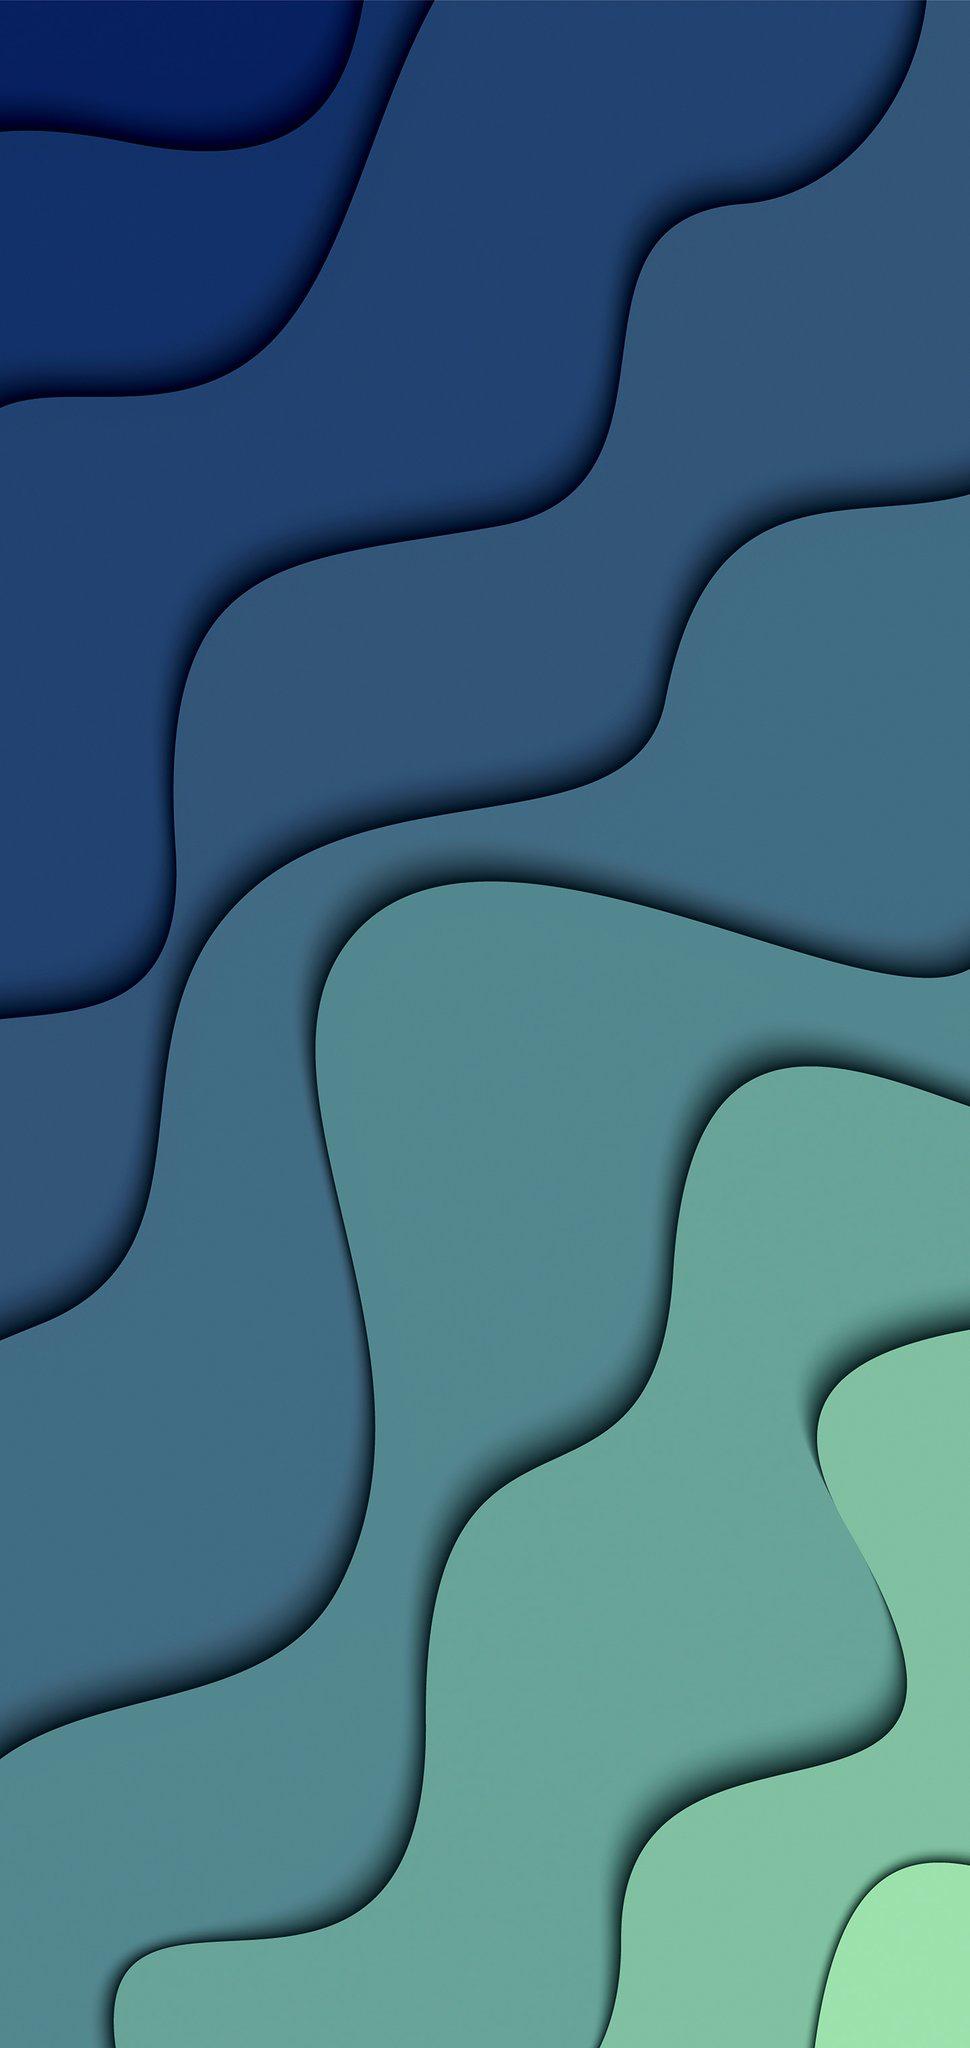 Abstract geometric iPhone wallpaper ieditwalls iDownloadBlog 7